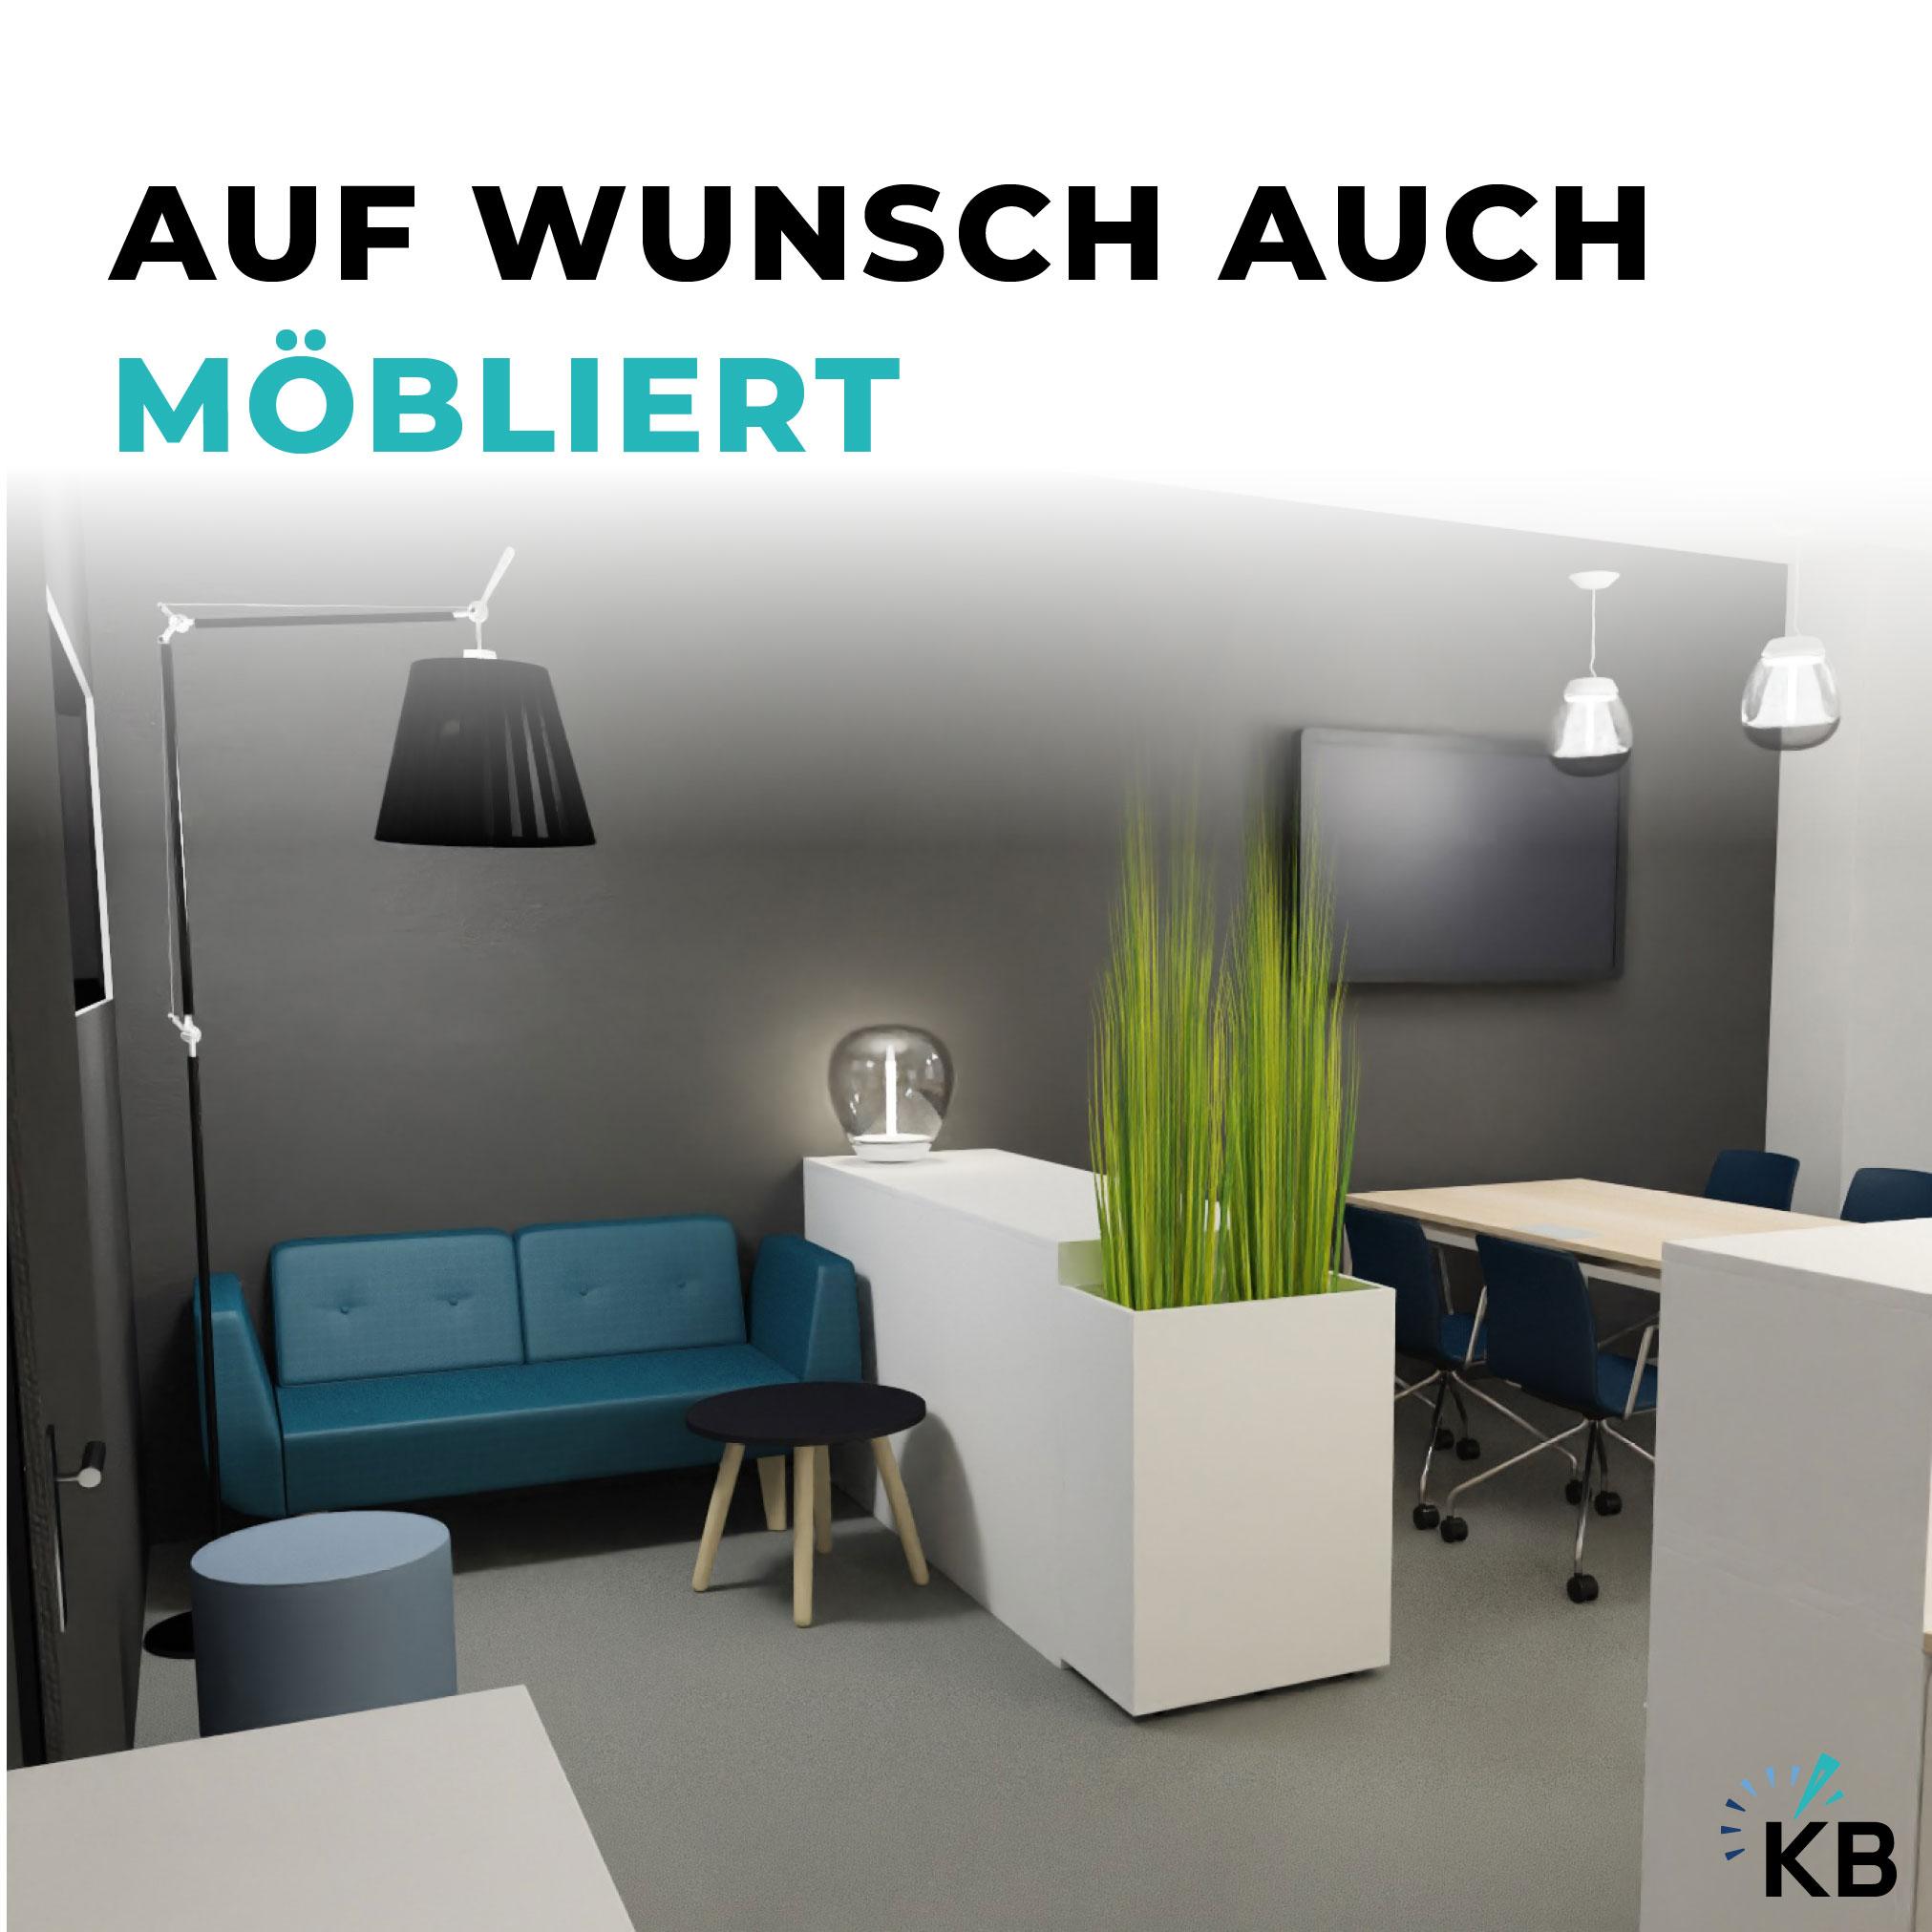 KlausBaum_Transporte_FACEBOOK_2020_April_Posting_jb5